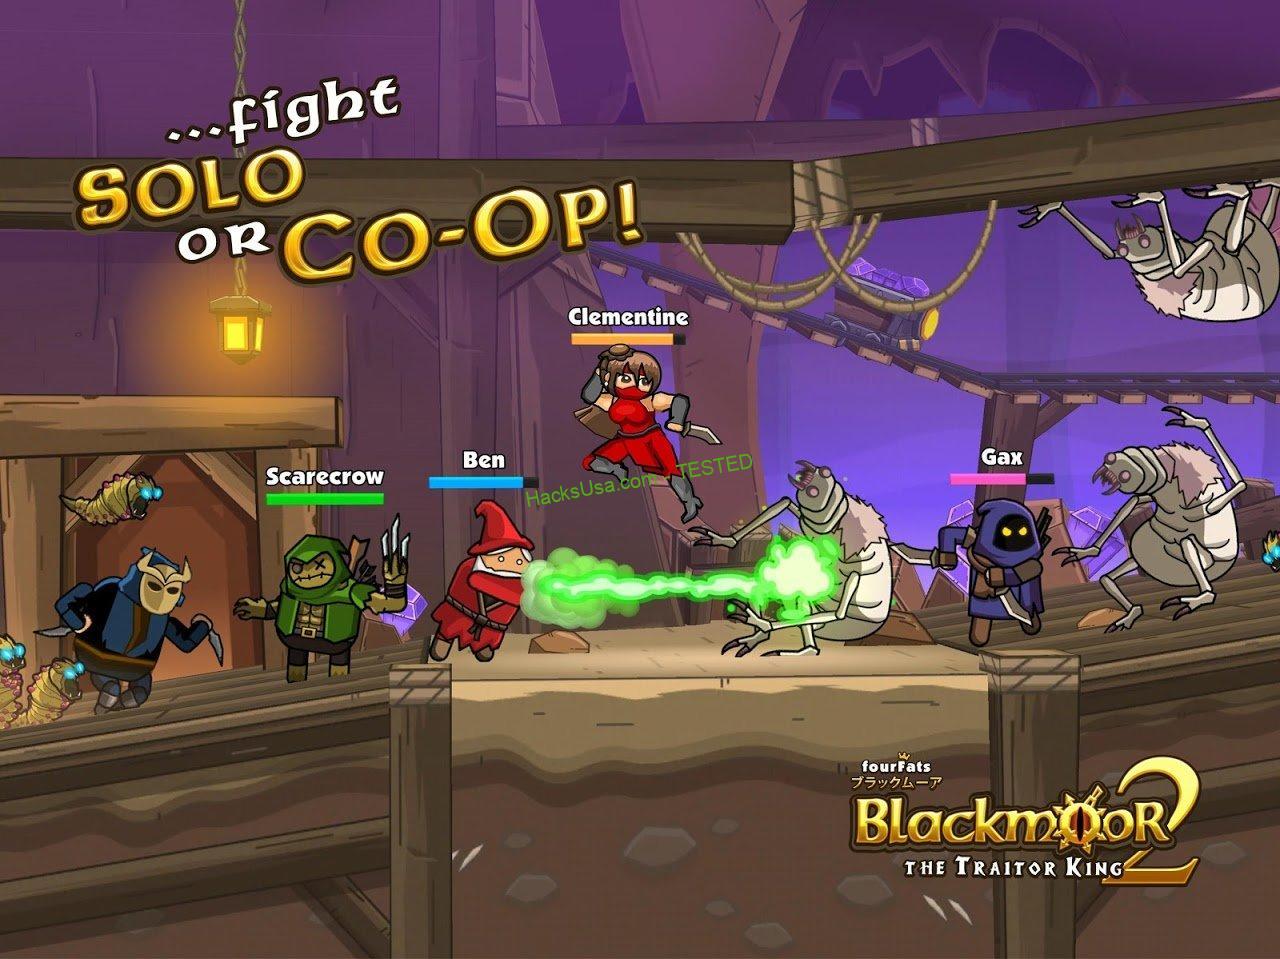 Blackmoor 2 Gameplay